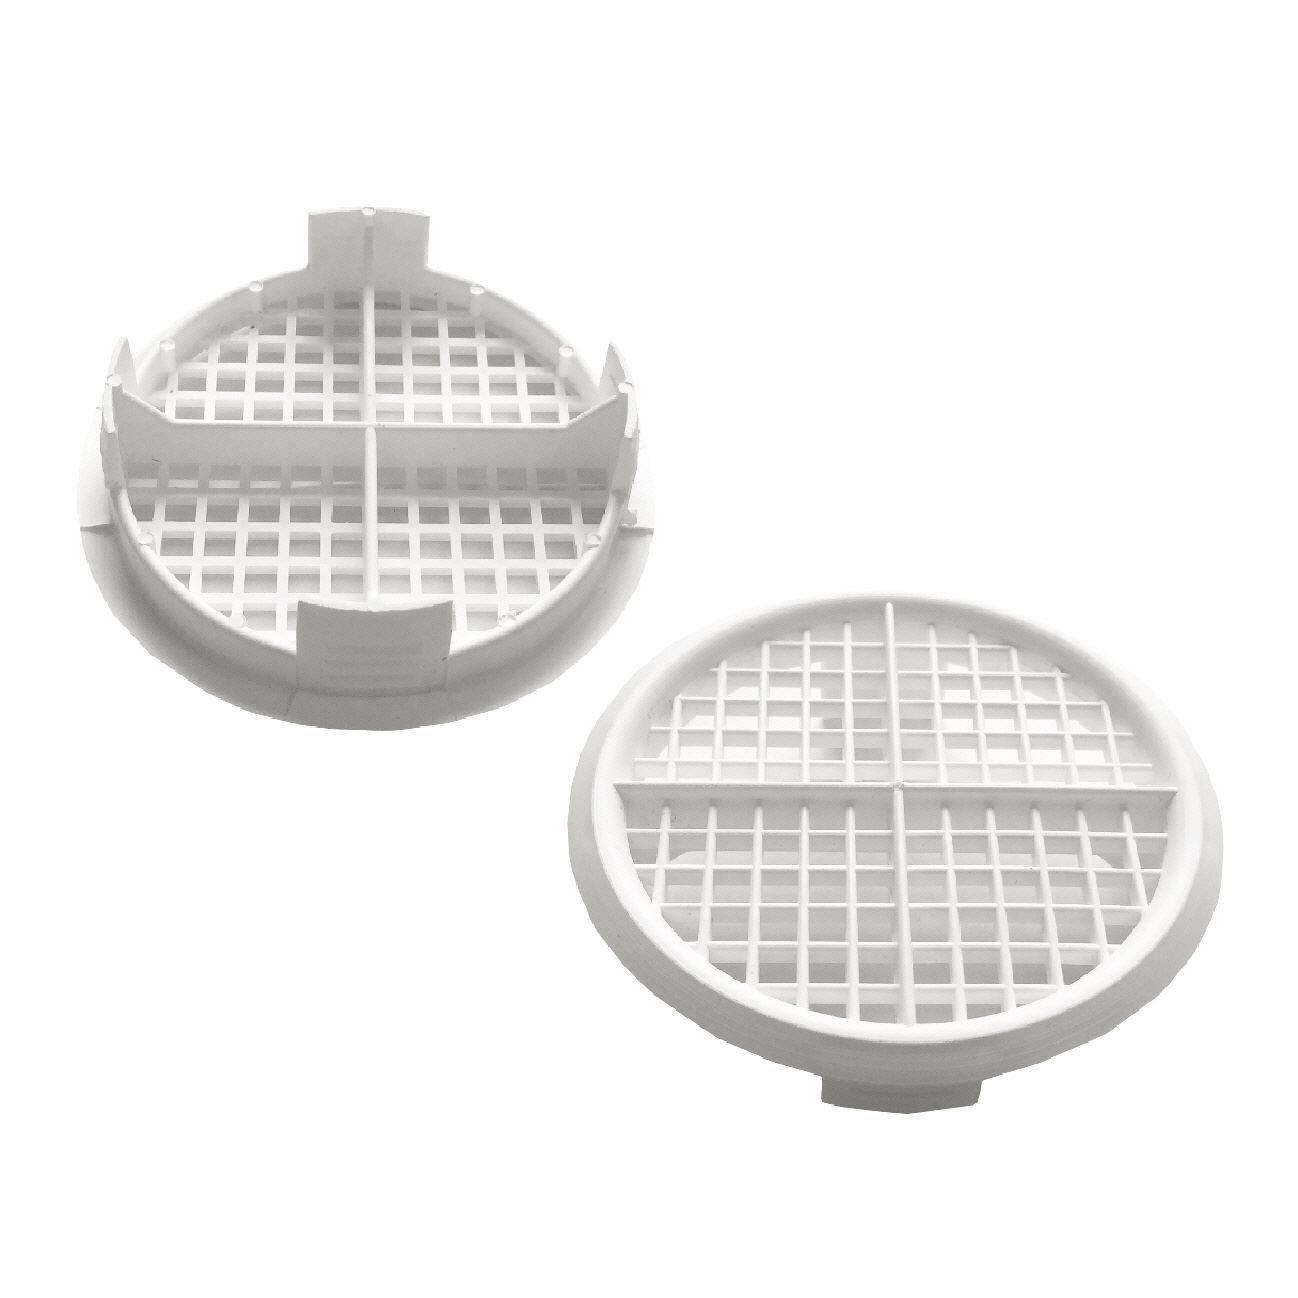 25 x 70mm White Plastic Round Soffit Air Vents / Upvc Push Fit Eaves Disc Fascia